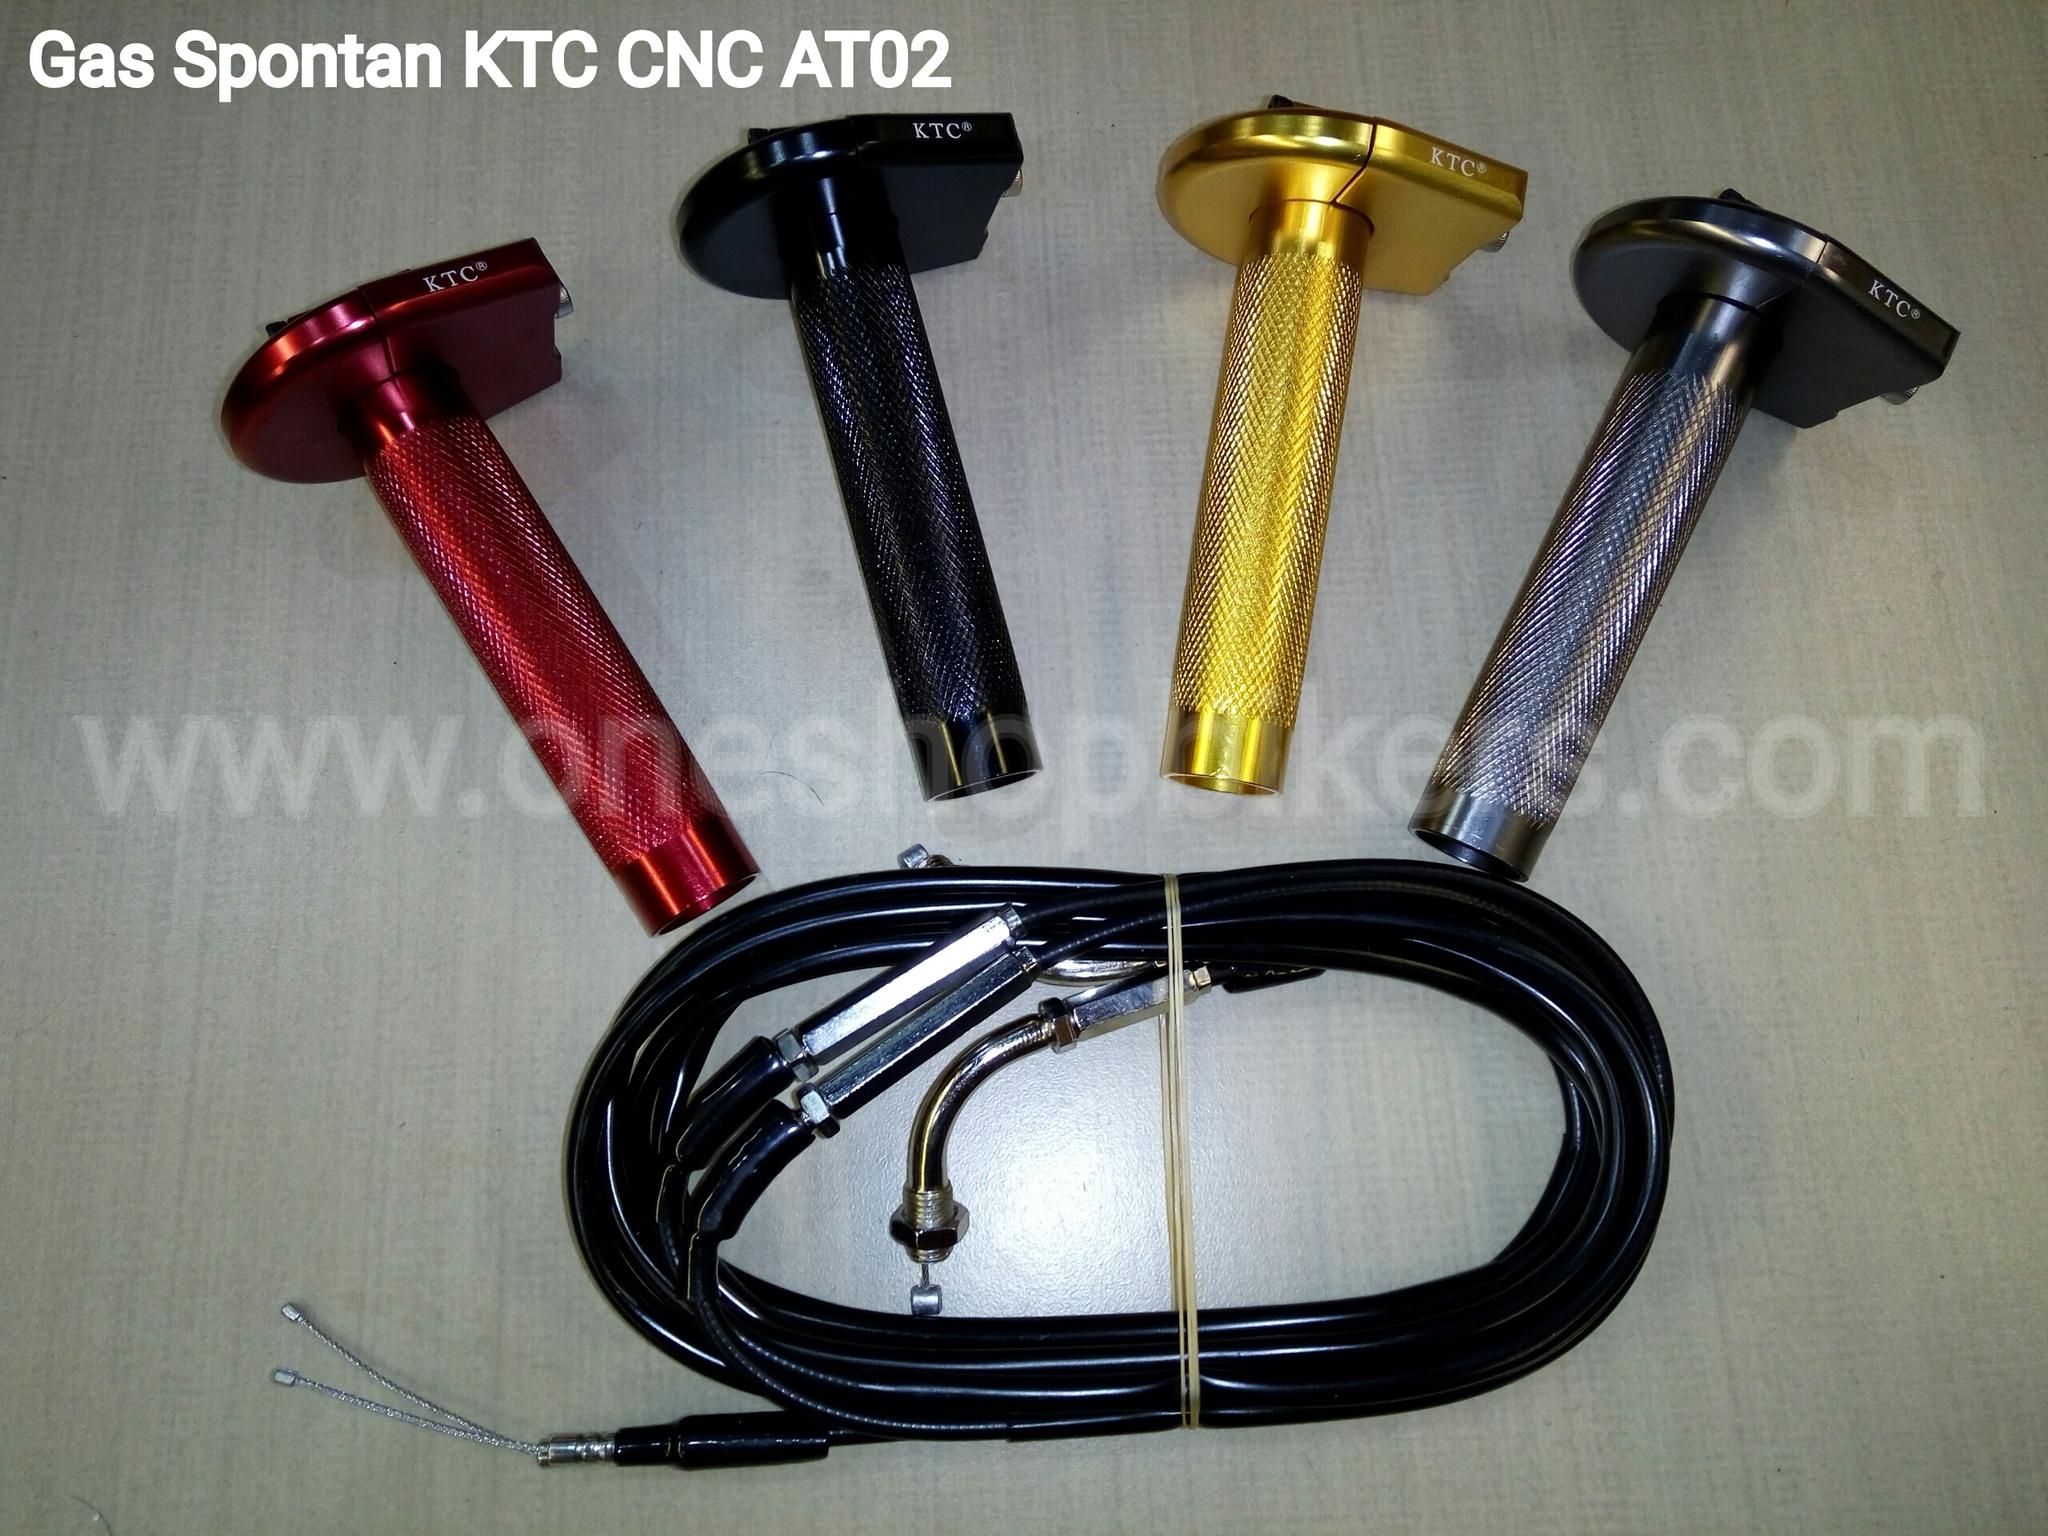 Jual Gas Spontan Ktc Cnc At02 1shop Bikers Partner Tokopedia Full